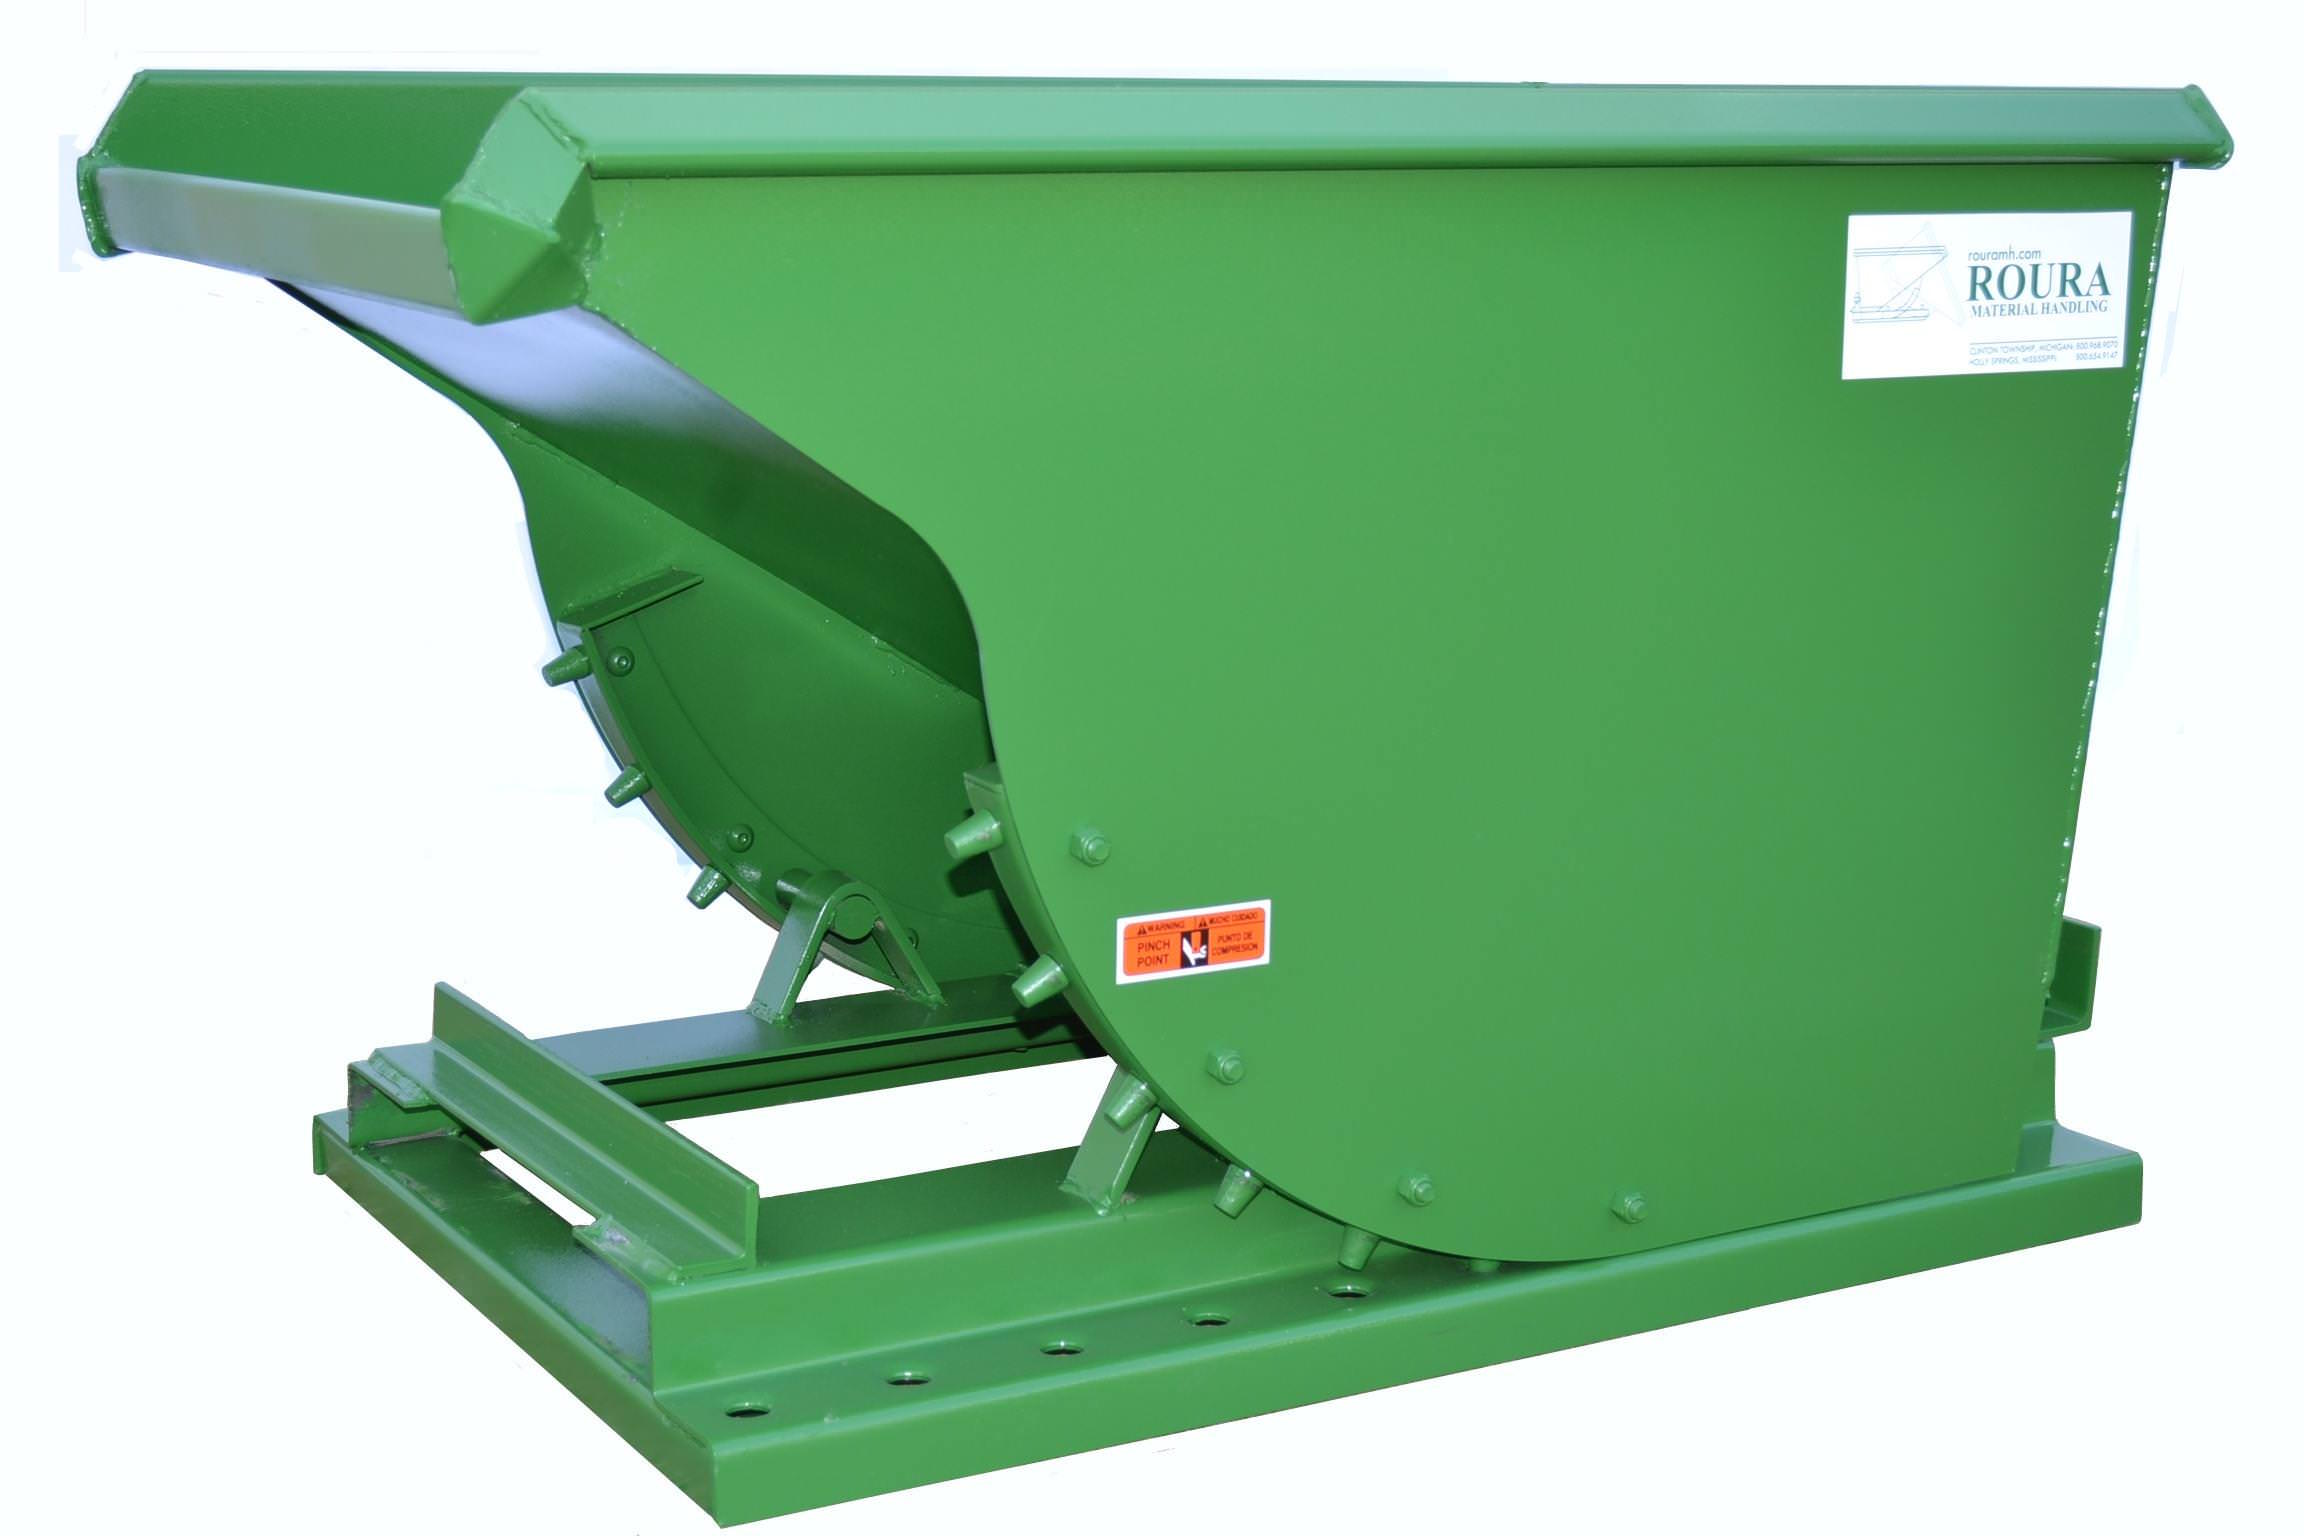 Durable 1 Yd Roura Self Dumping Hopper Tp Supply